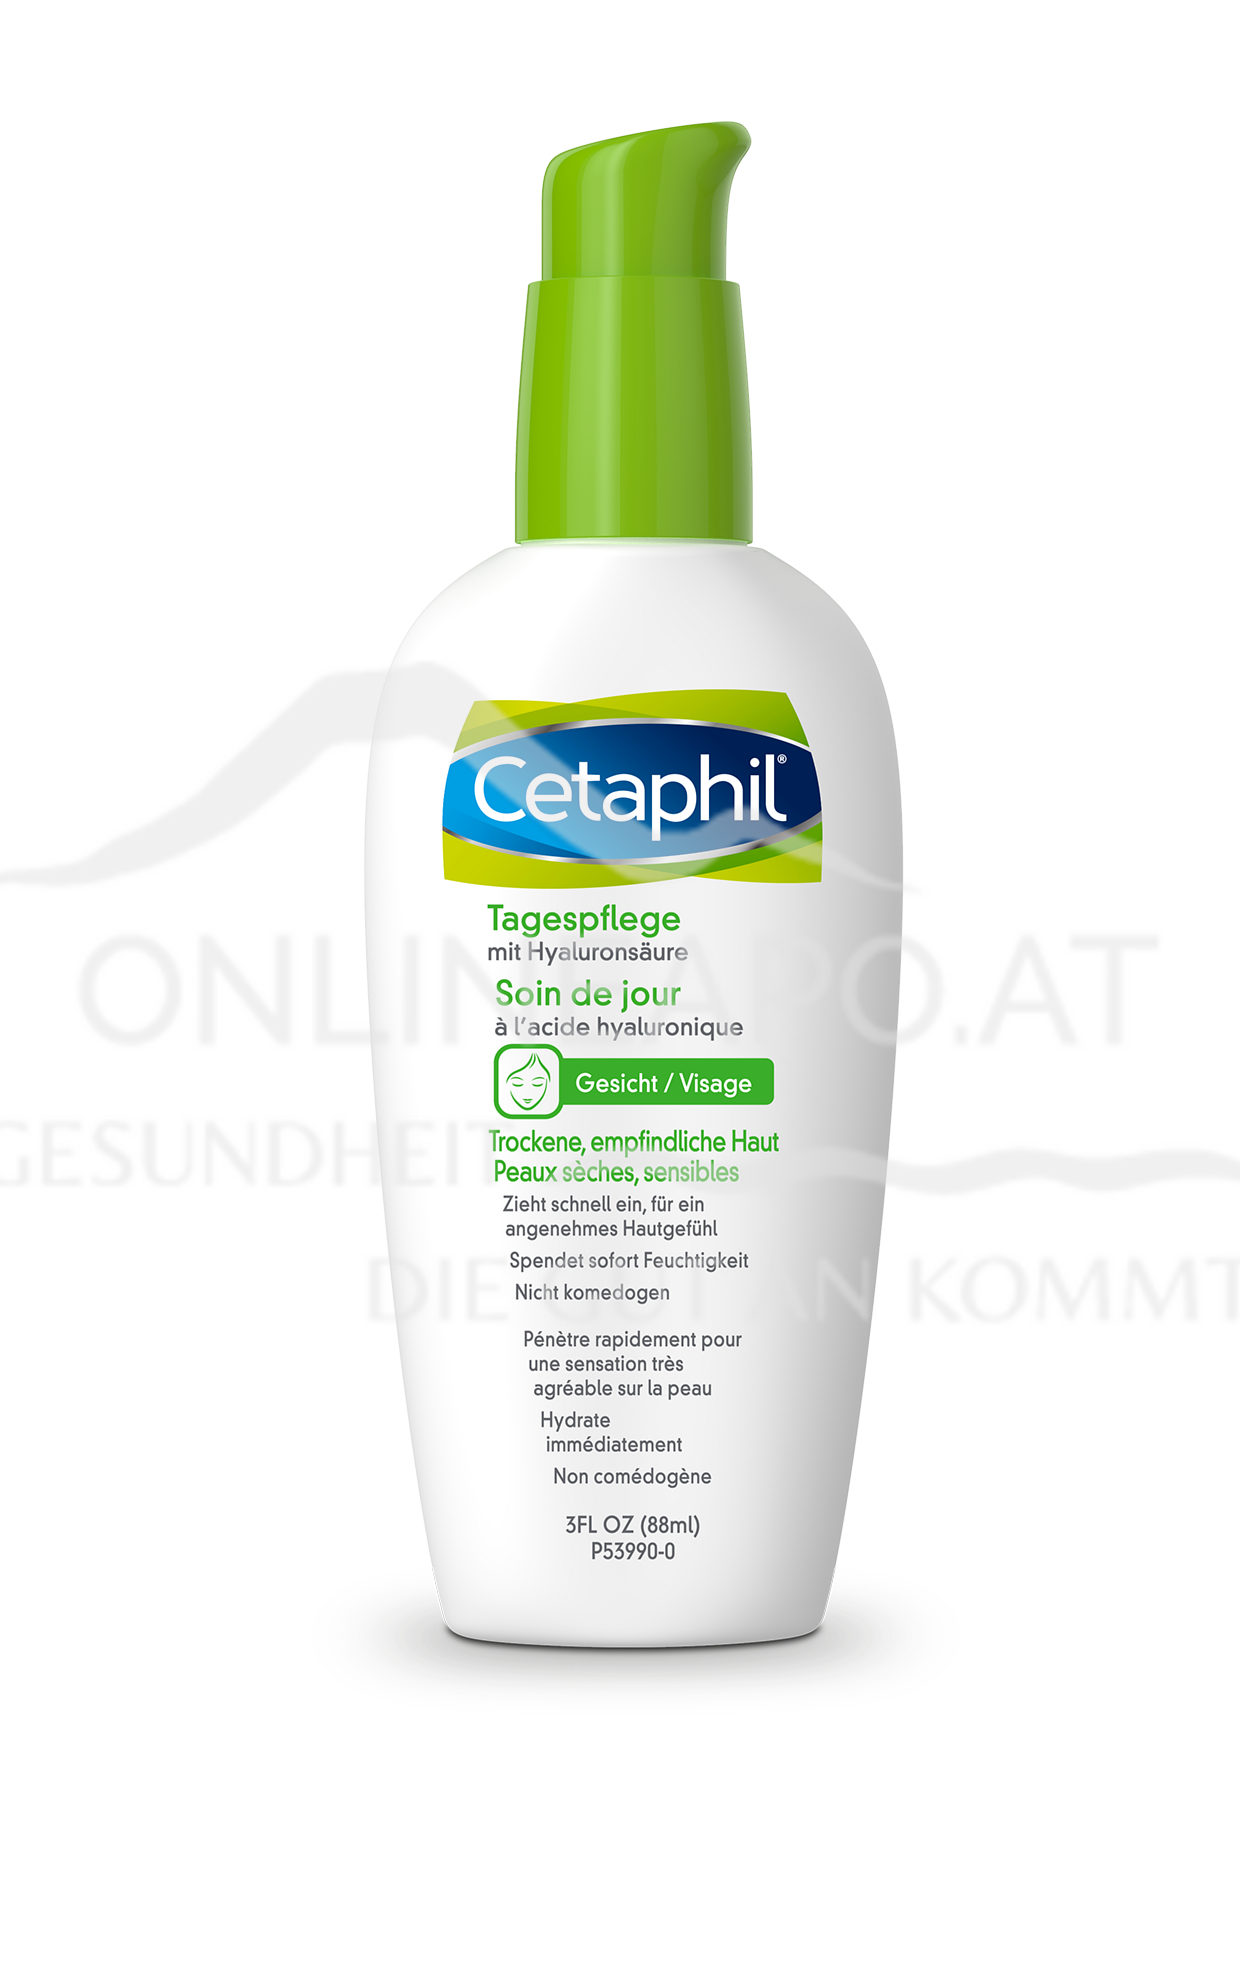 Cetaphil® Tagespflege mit Hyaluronsäure